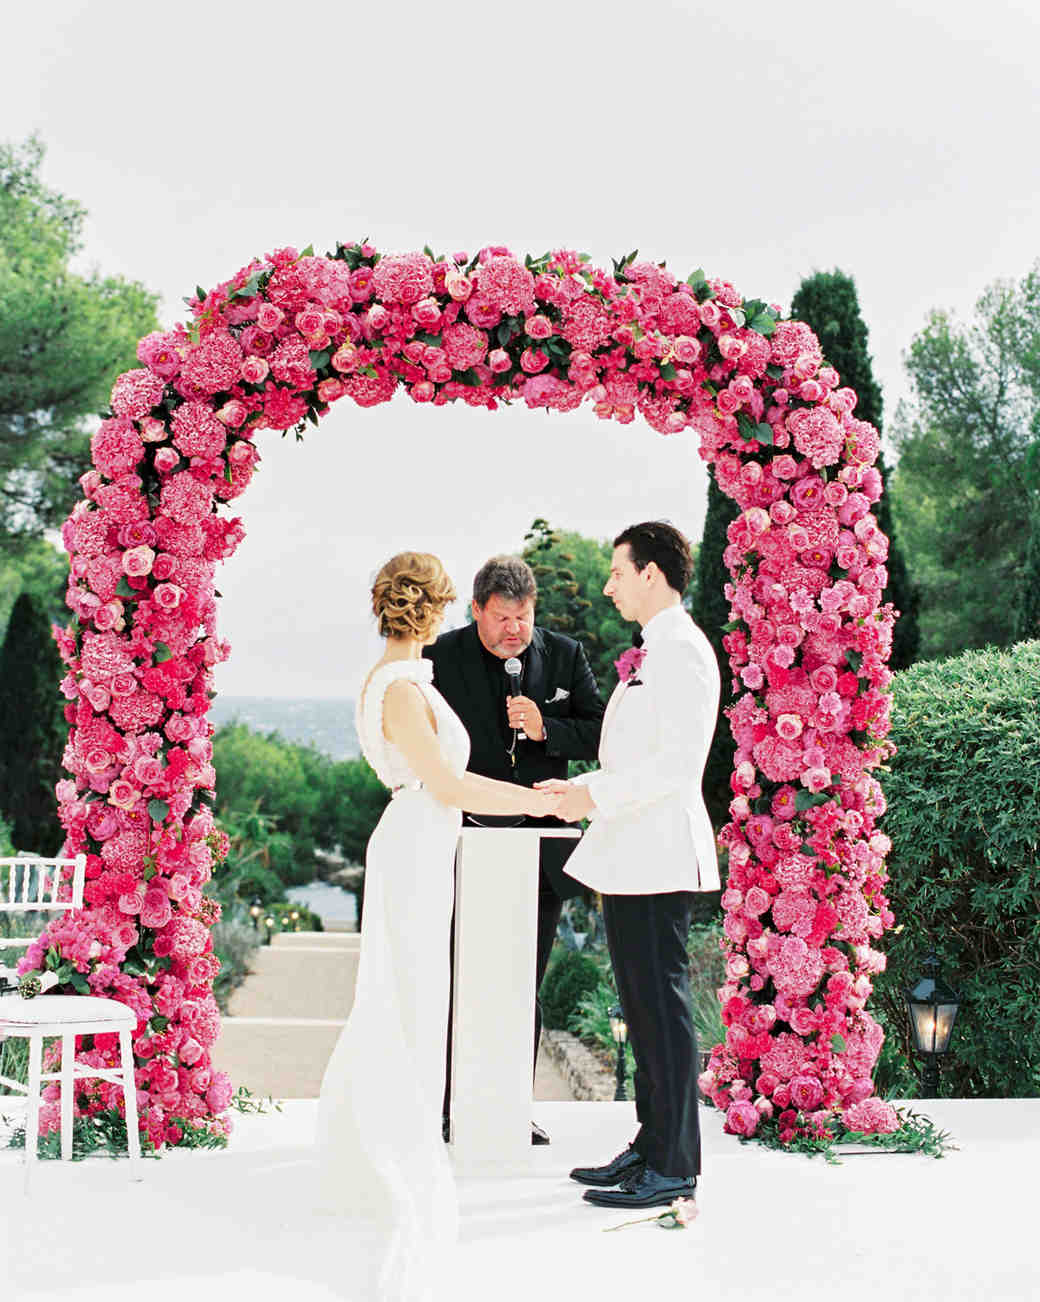 stephanie nikolaus wedding ceremony couple